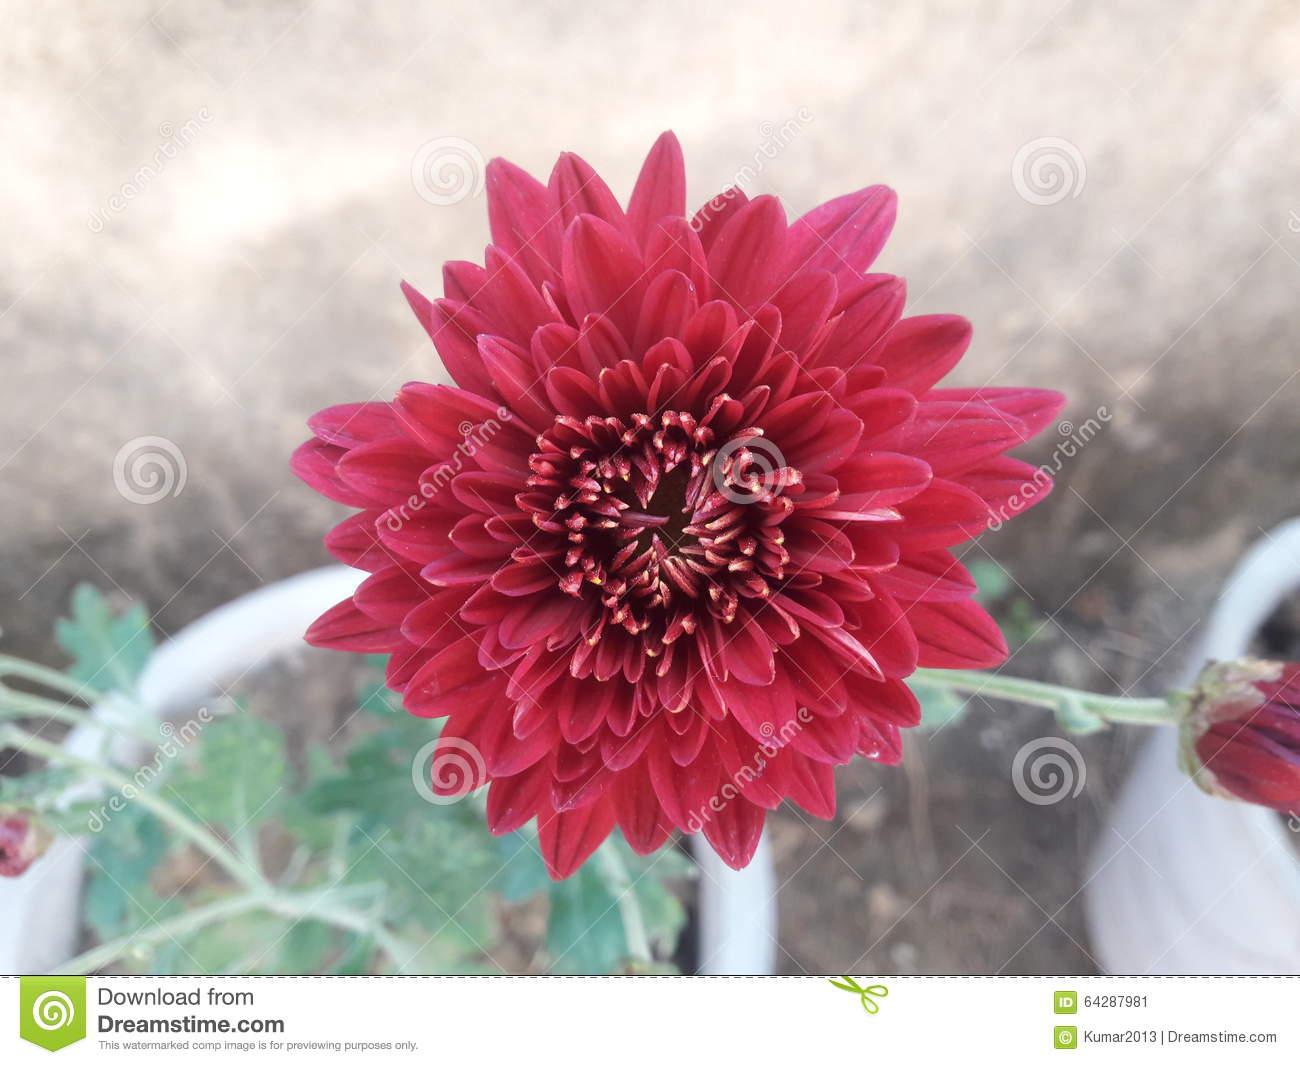 Maroon Crysanthemum Flower Close Up Stock Photo.